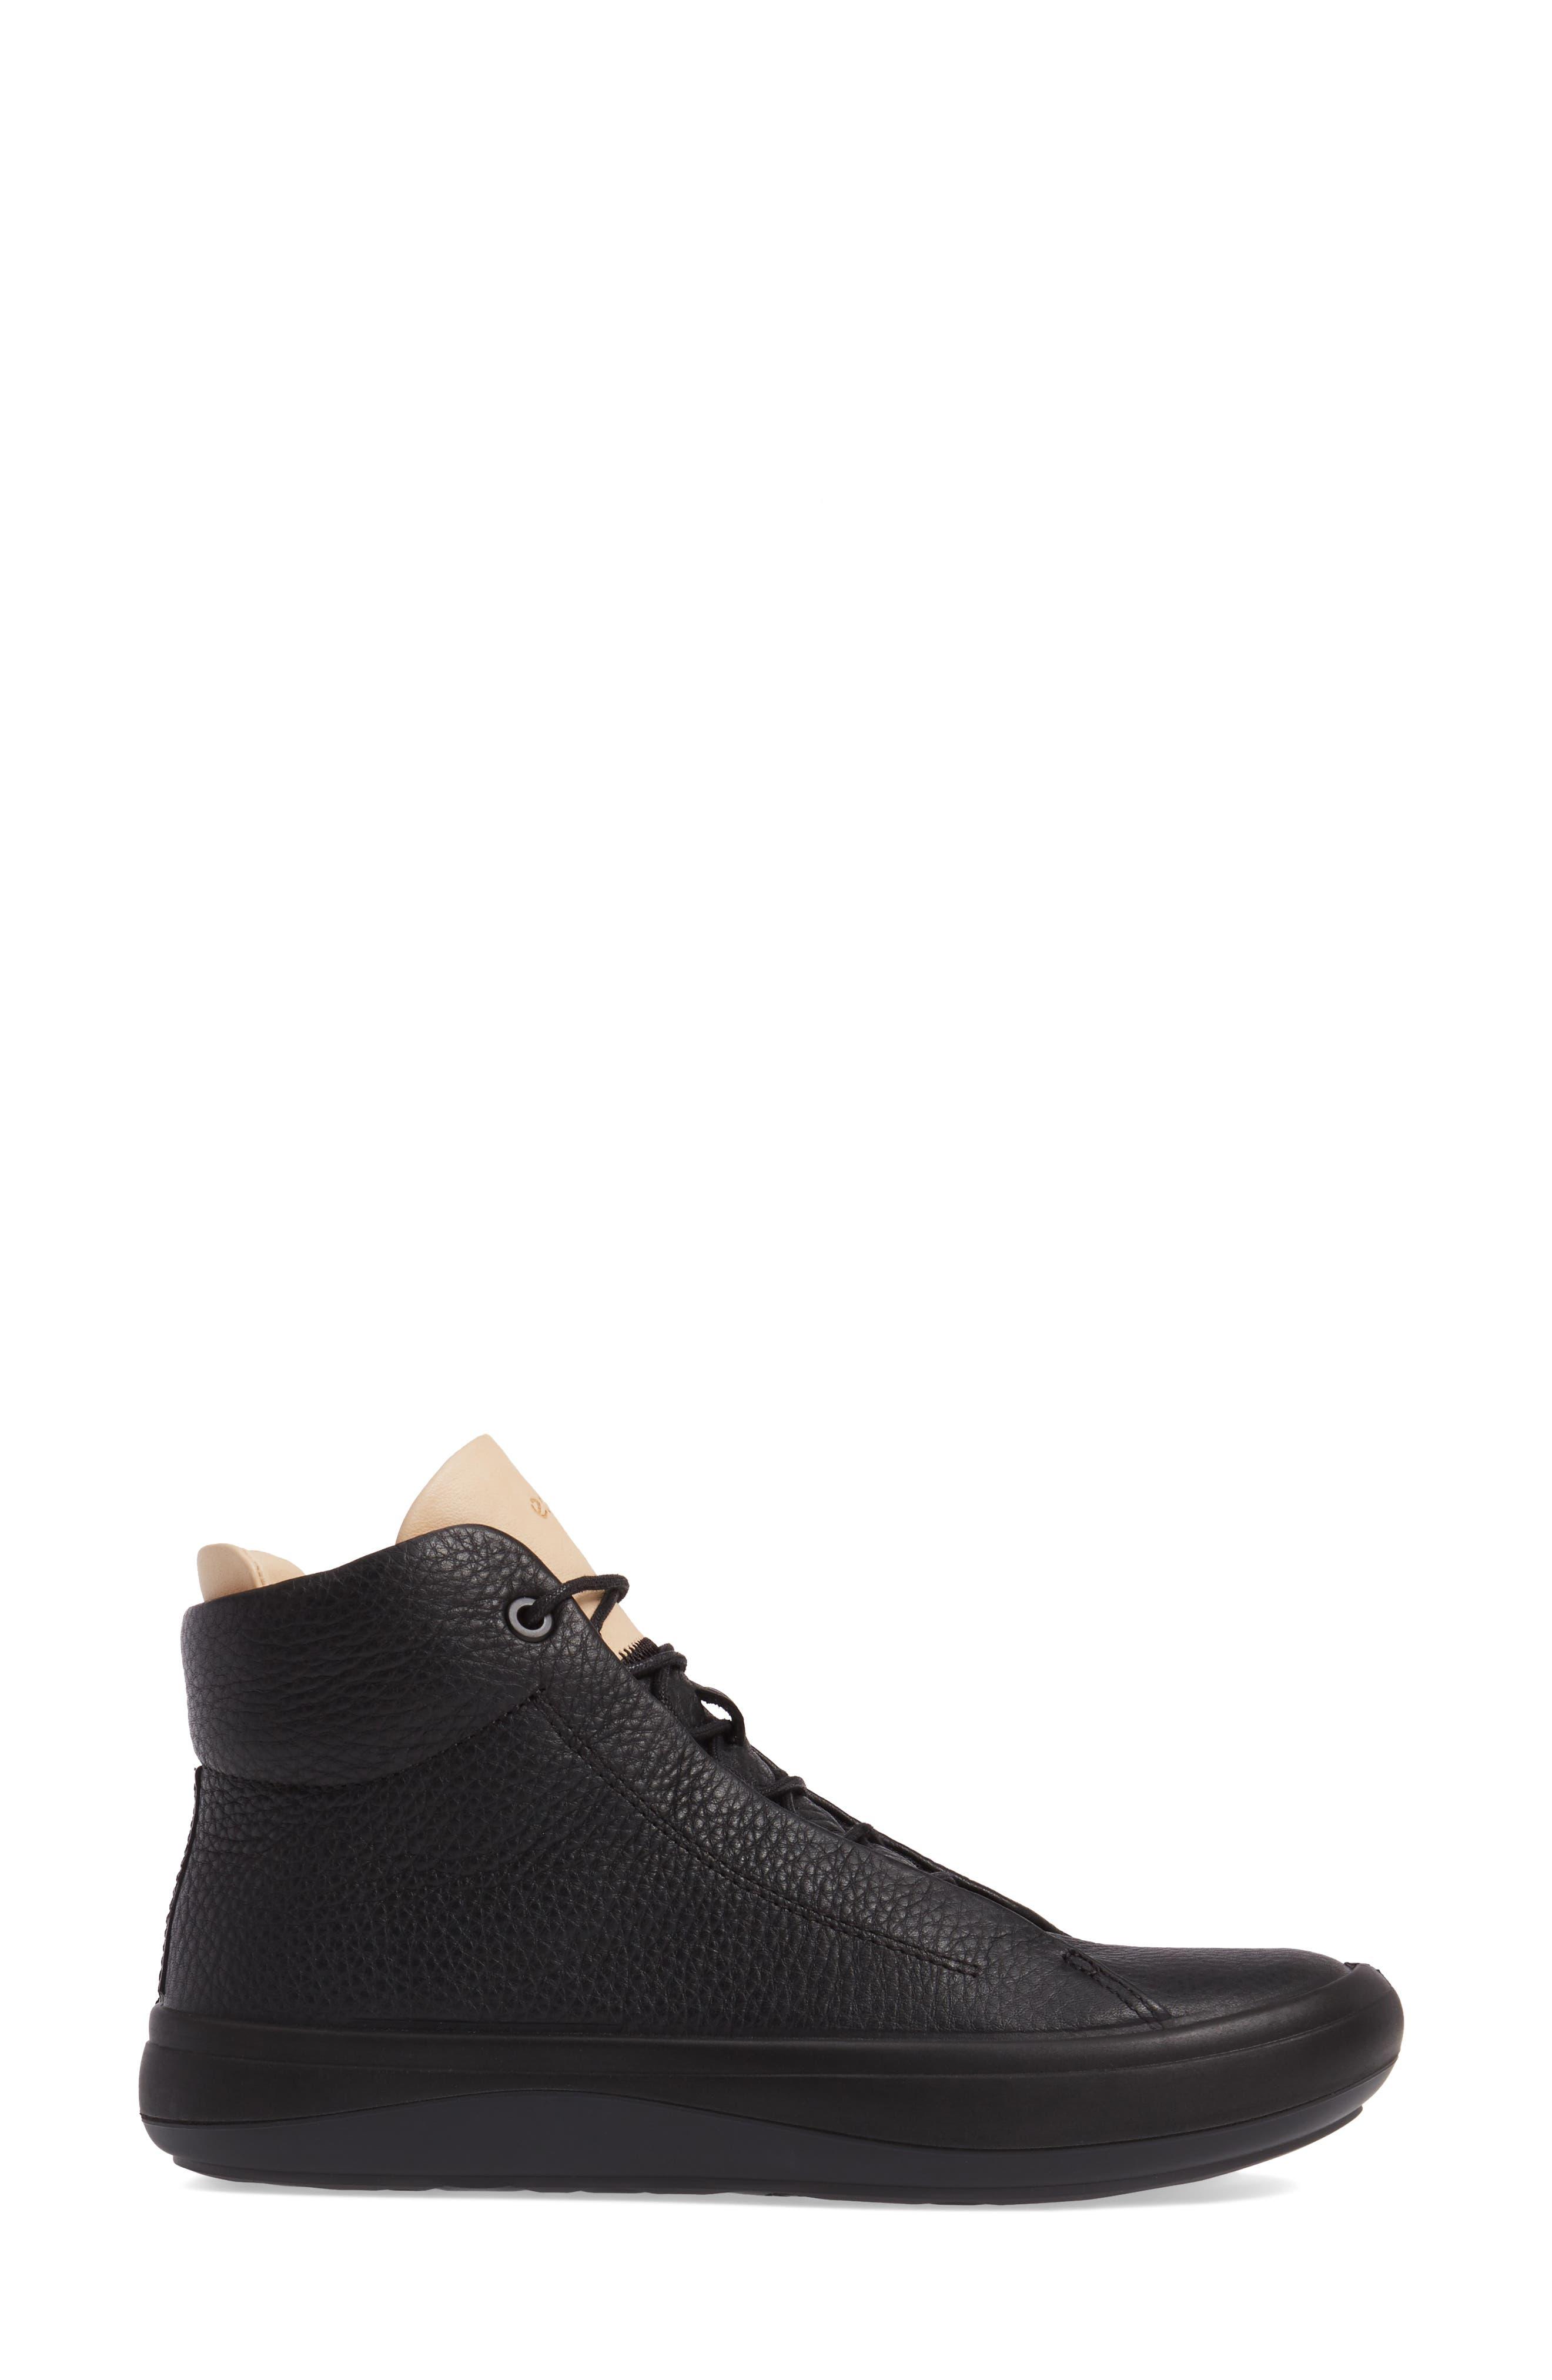 Kinhin Sneaker,                             Alternate thumbnail 3, color,                             013